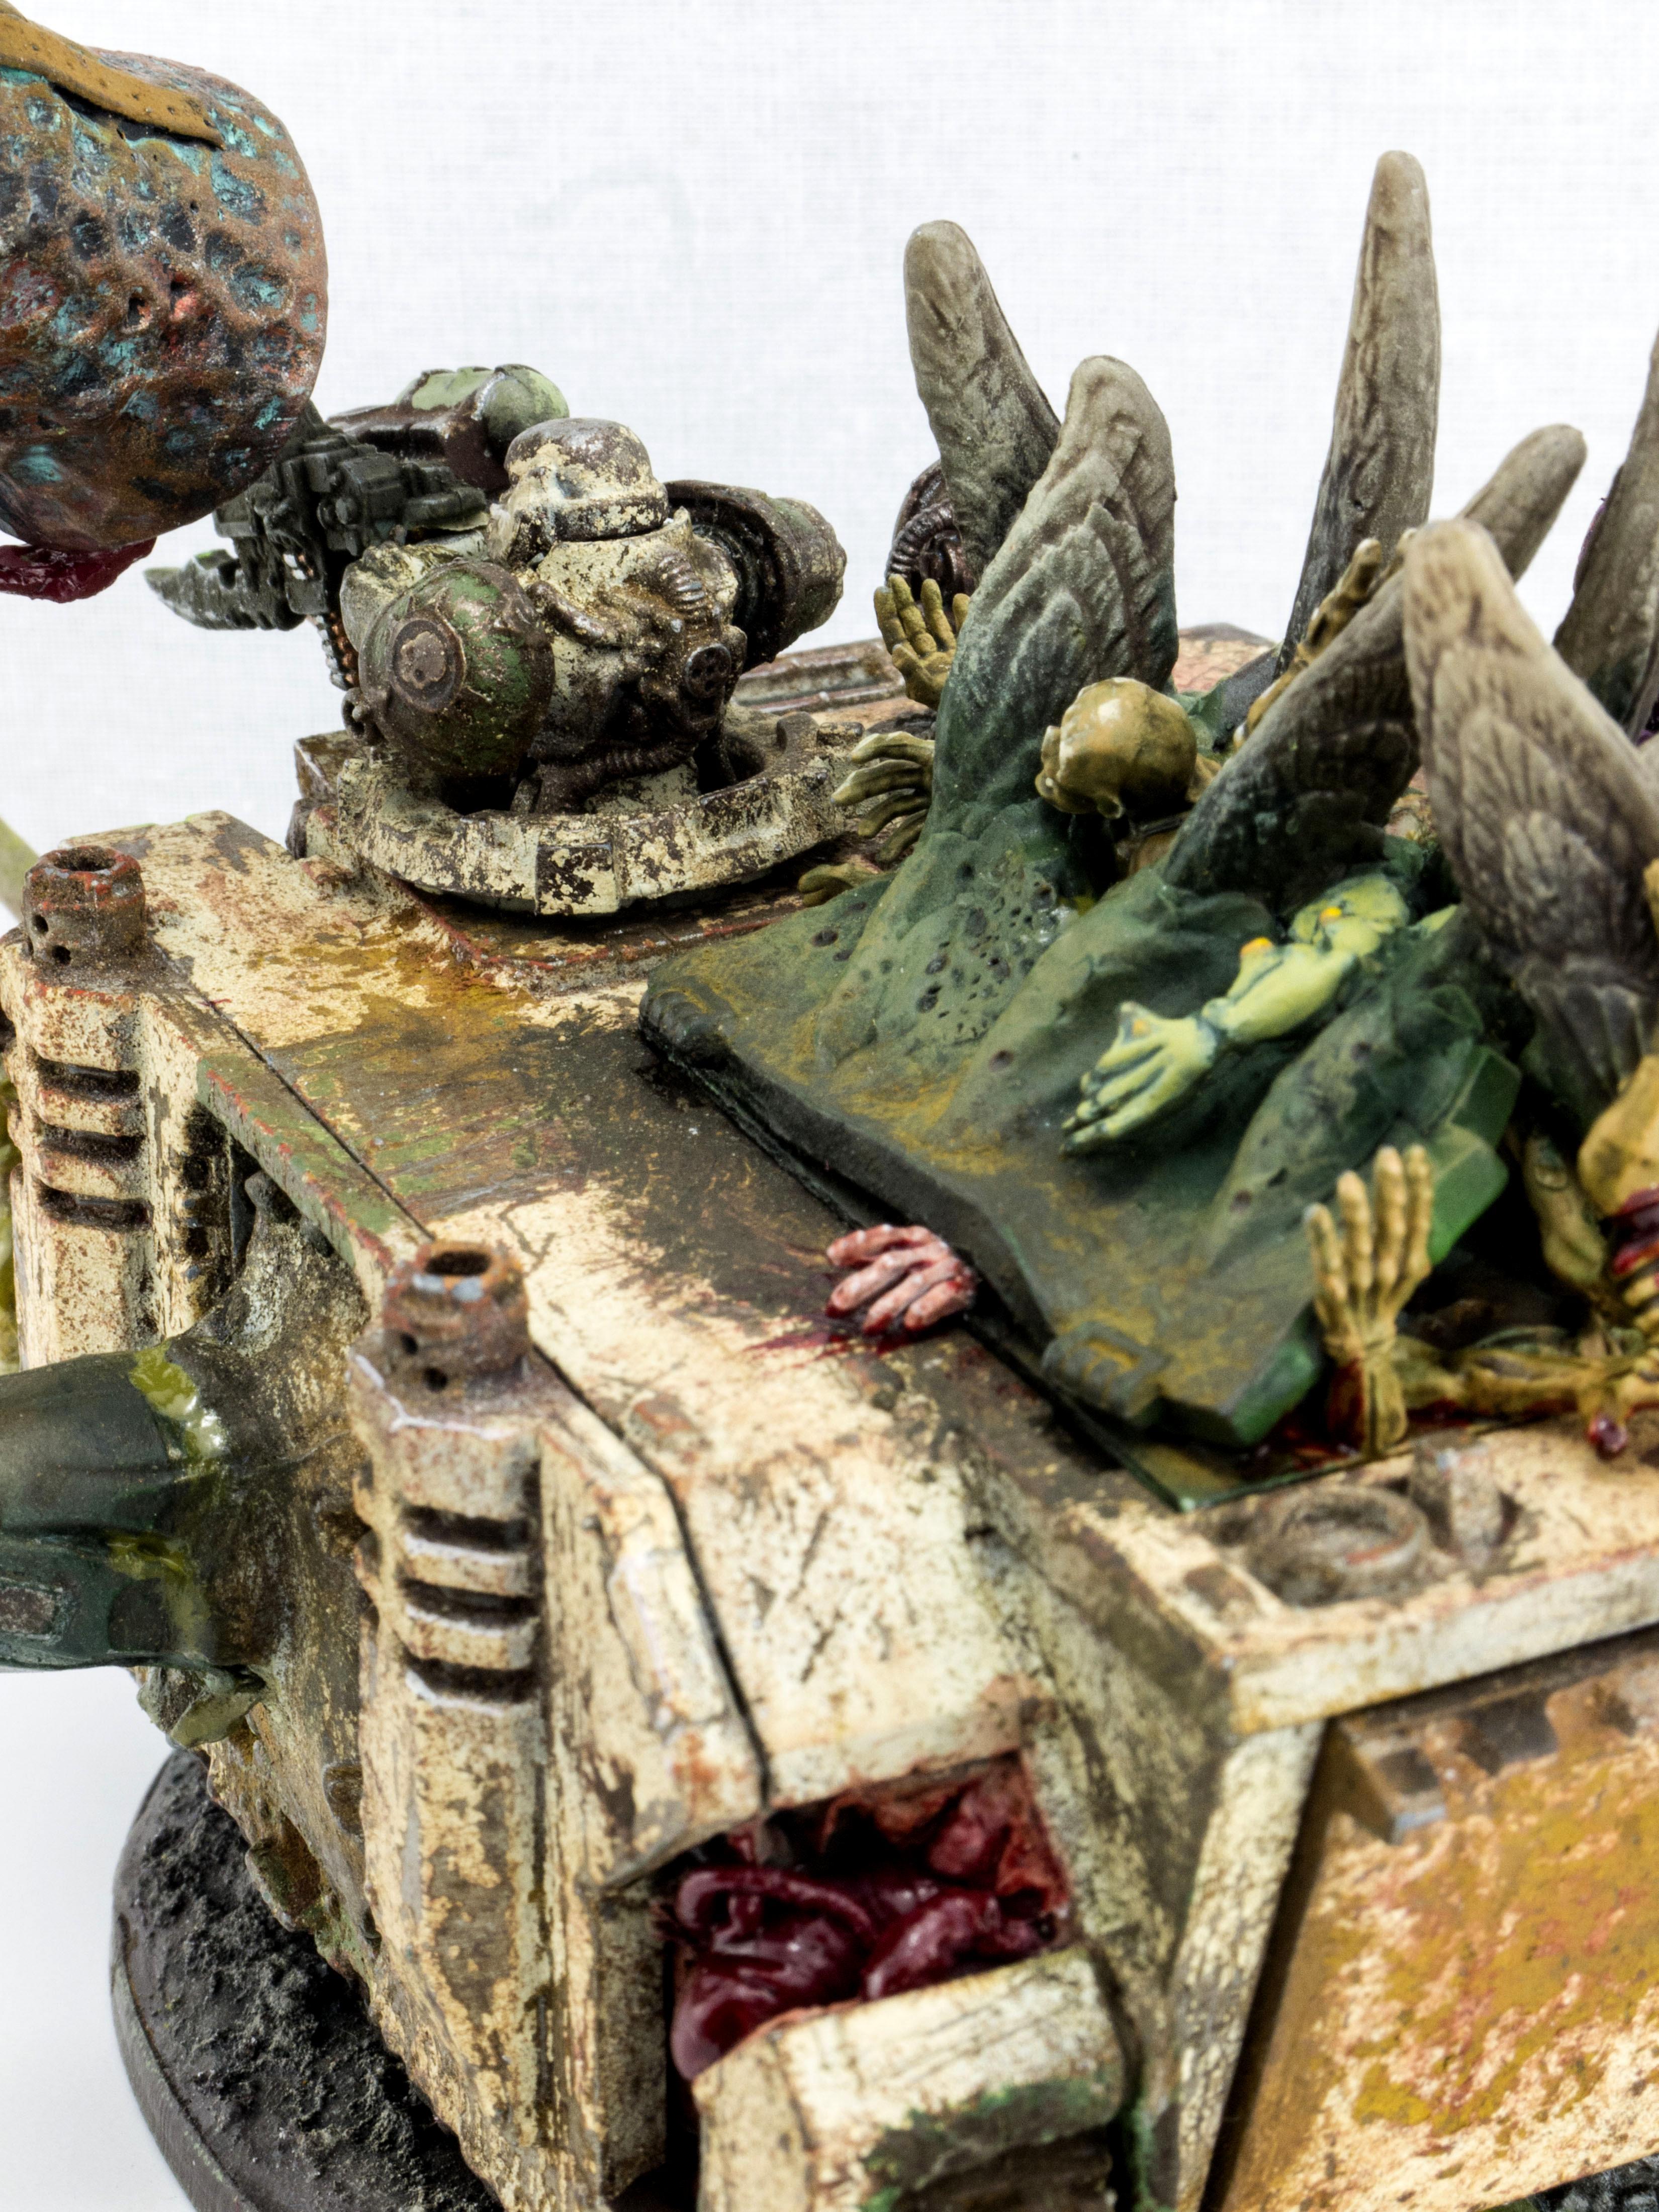 Bell, Death Chime, Death Guard, Dedicated Transport, Nurgle, Predator, Rhino, Tentacles, Zombie